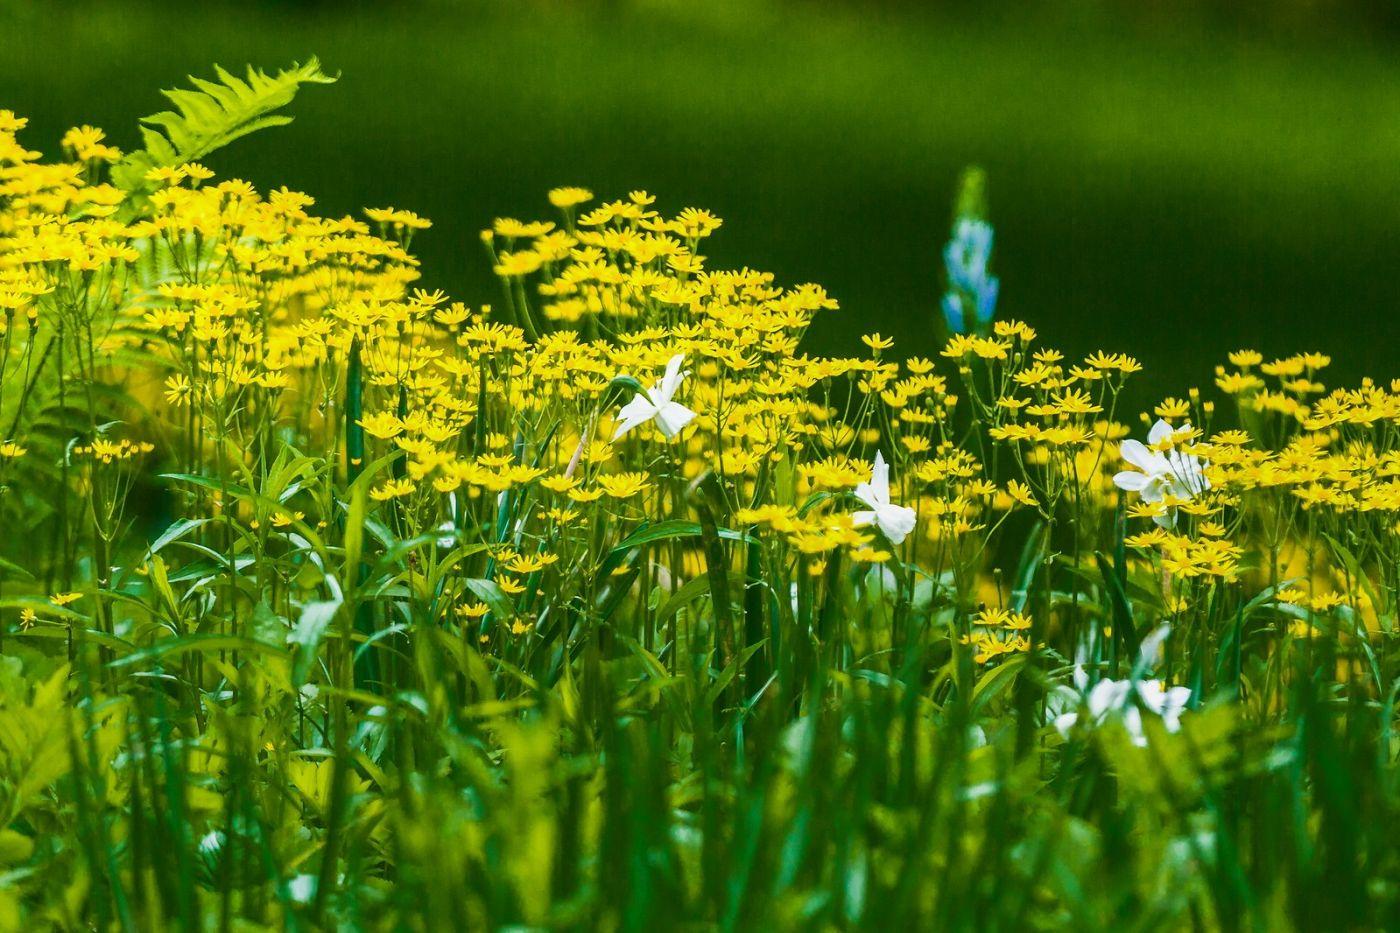 Chanticleer花园,有梦想的季节_图1-15